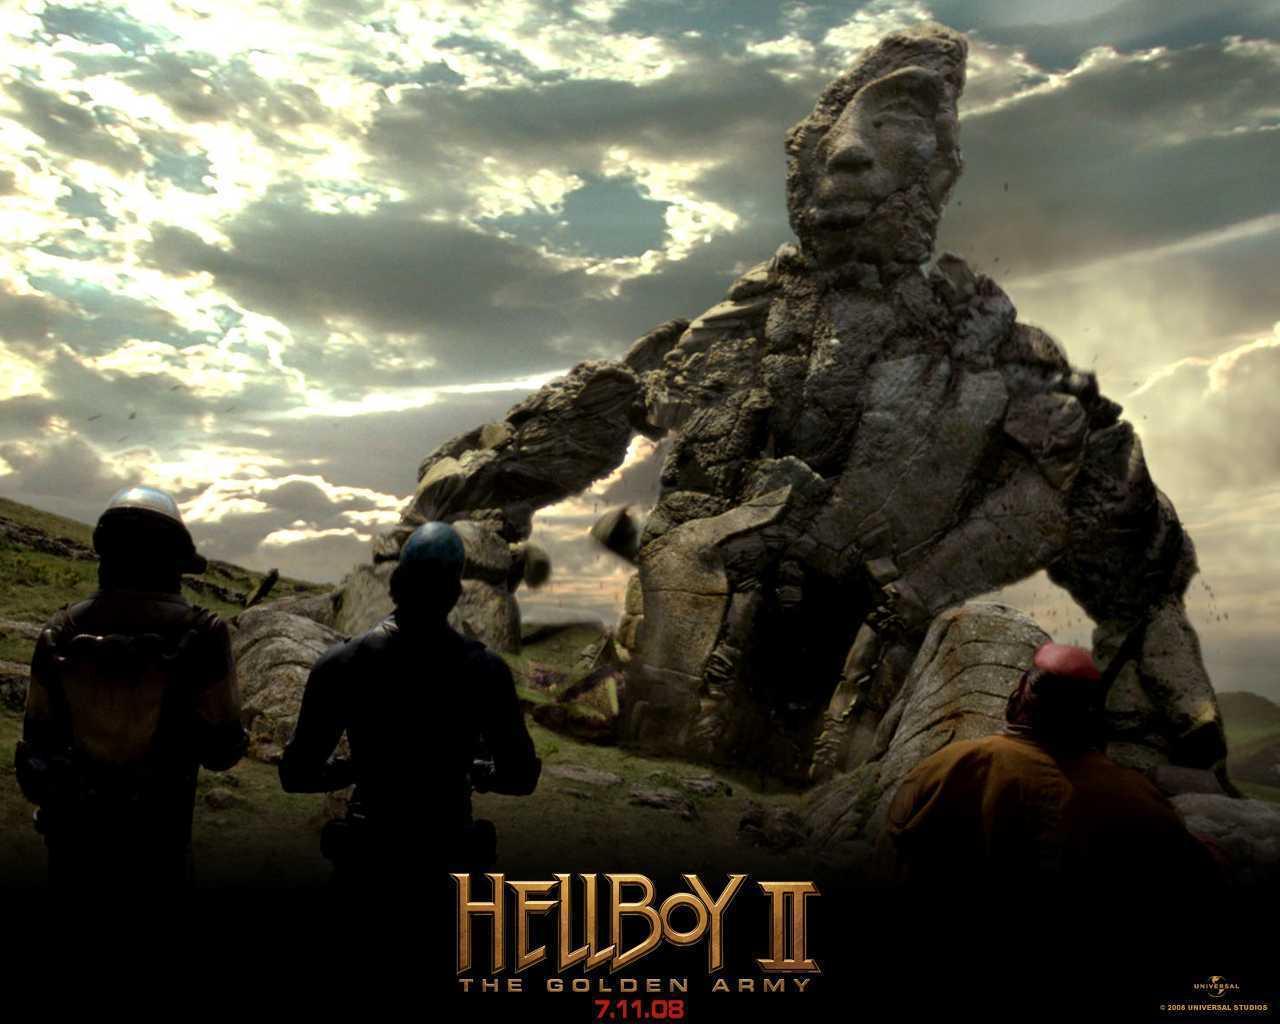 Hellboy Ii The Golden Army Images Hellboy Ii Hd Wallpaper